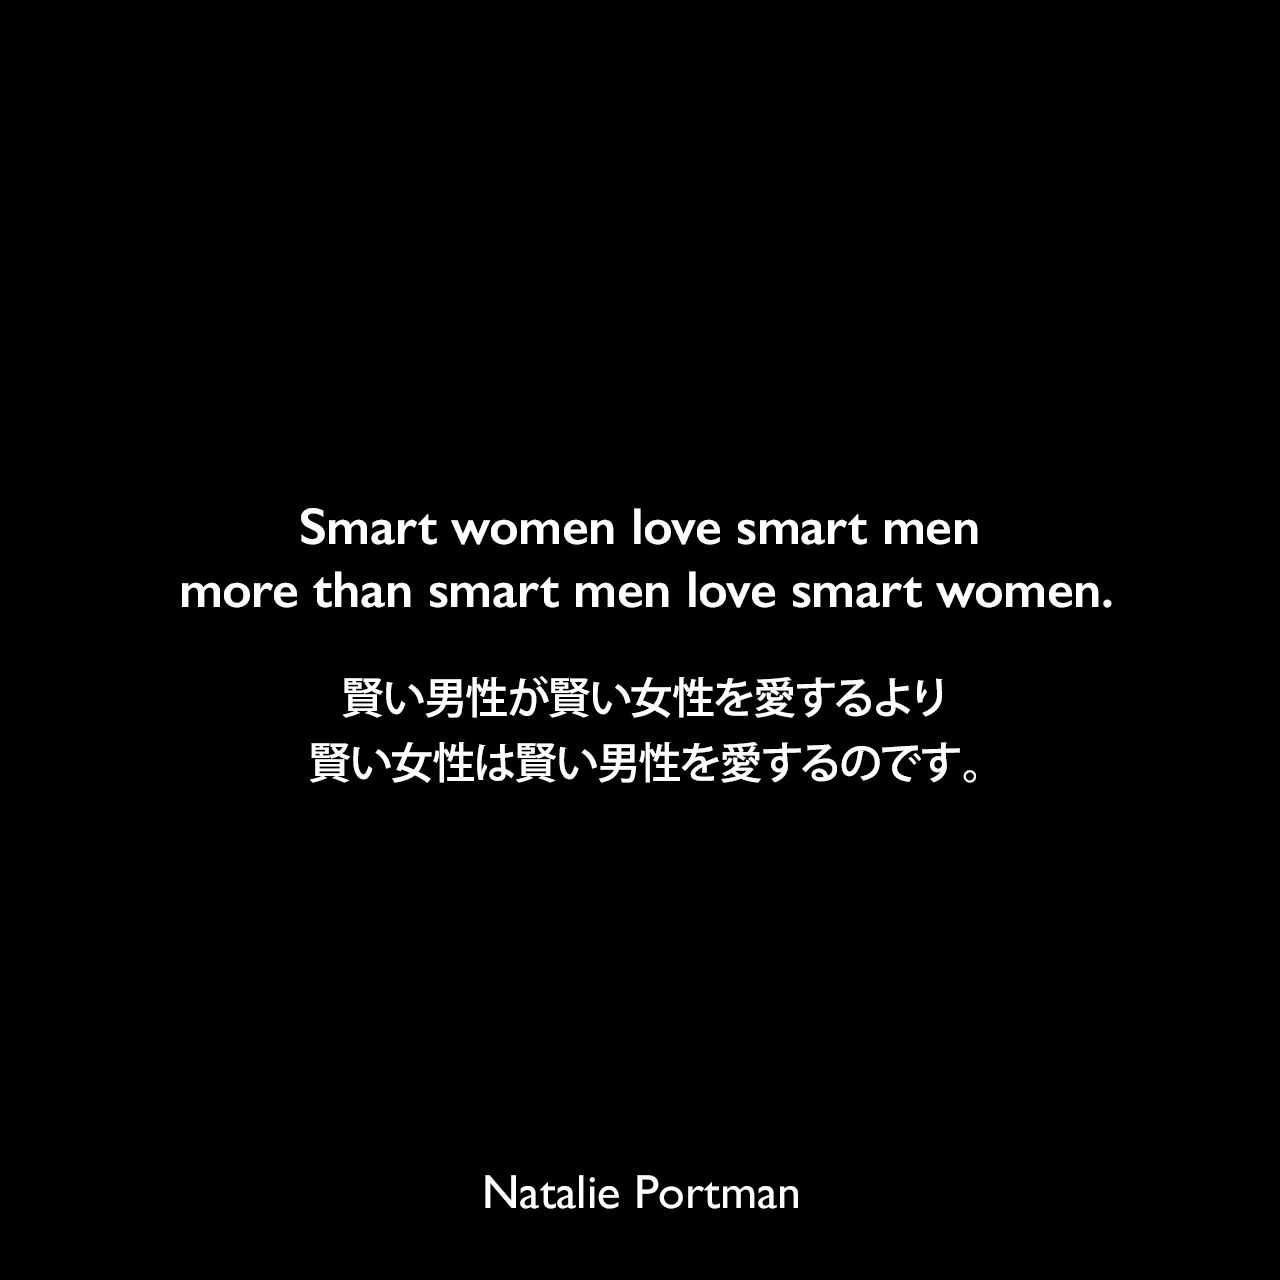 Smart women love smart men more than smart men love smart women.賢い男性が賢い女性を愛するより、賢い女性は賢い男性を愛するのです。Natalie Portman